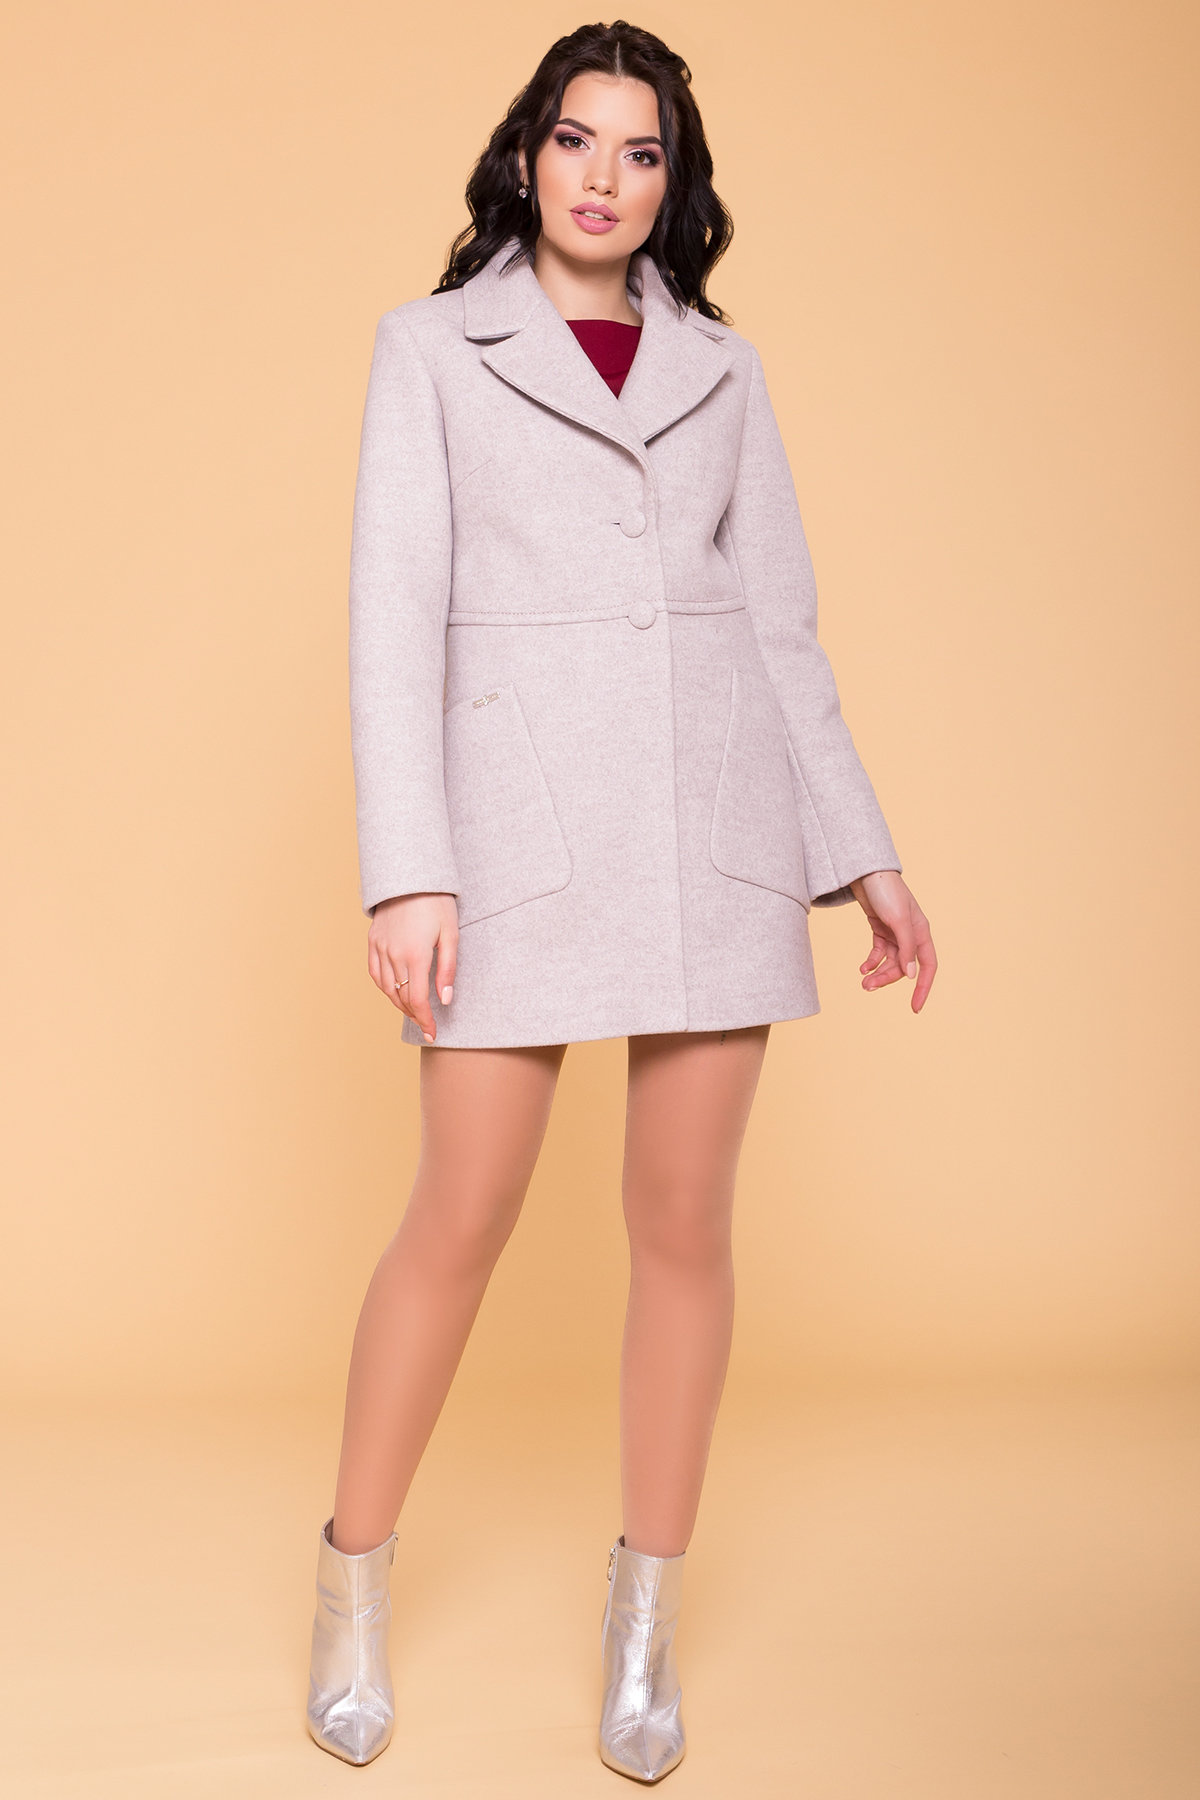 Пальто Кидмон 6220 АРТ. 41251 Цвет: Серо-бежевый 19 - фото 4, интернет магазин tm-modus.ru